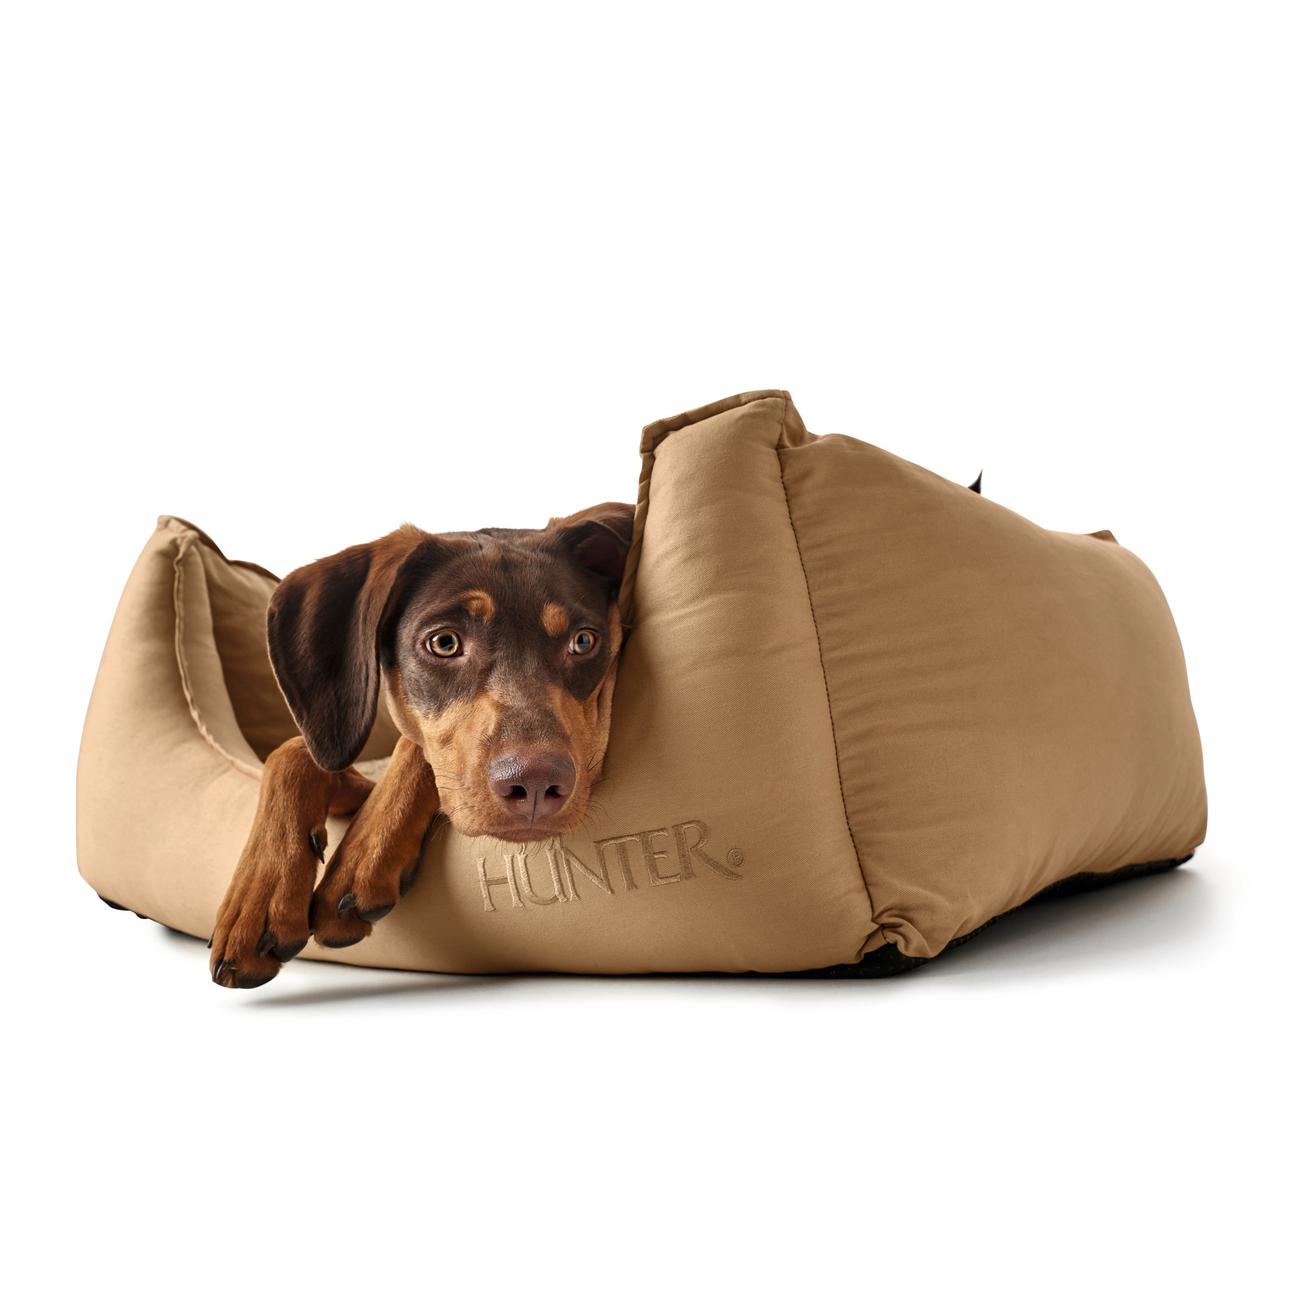 Hunter Hundesofa Sanremo 65105, Bild 8